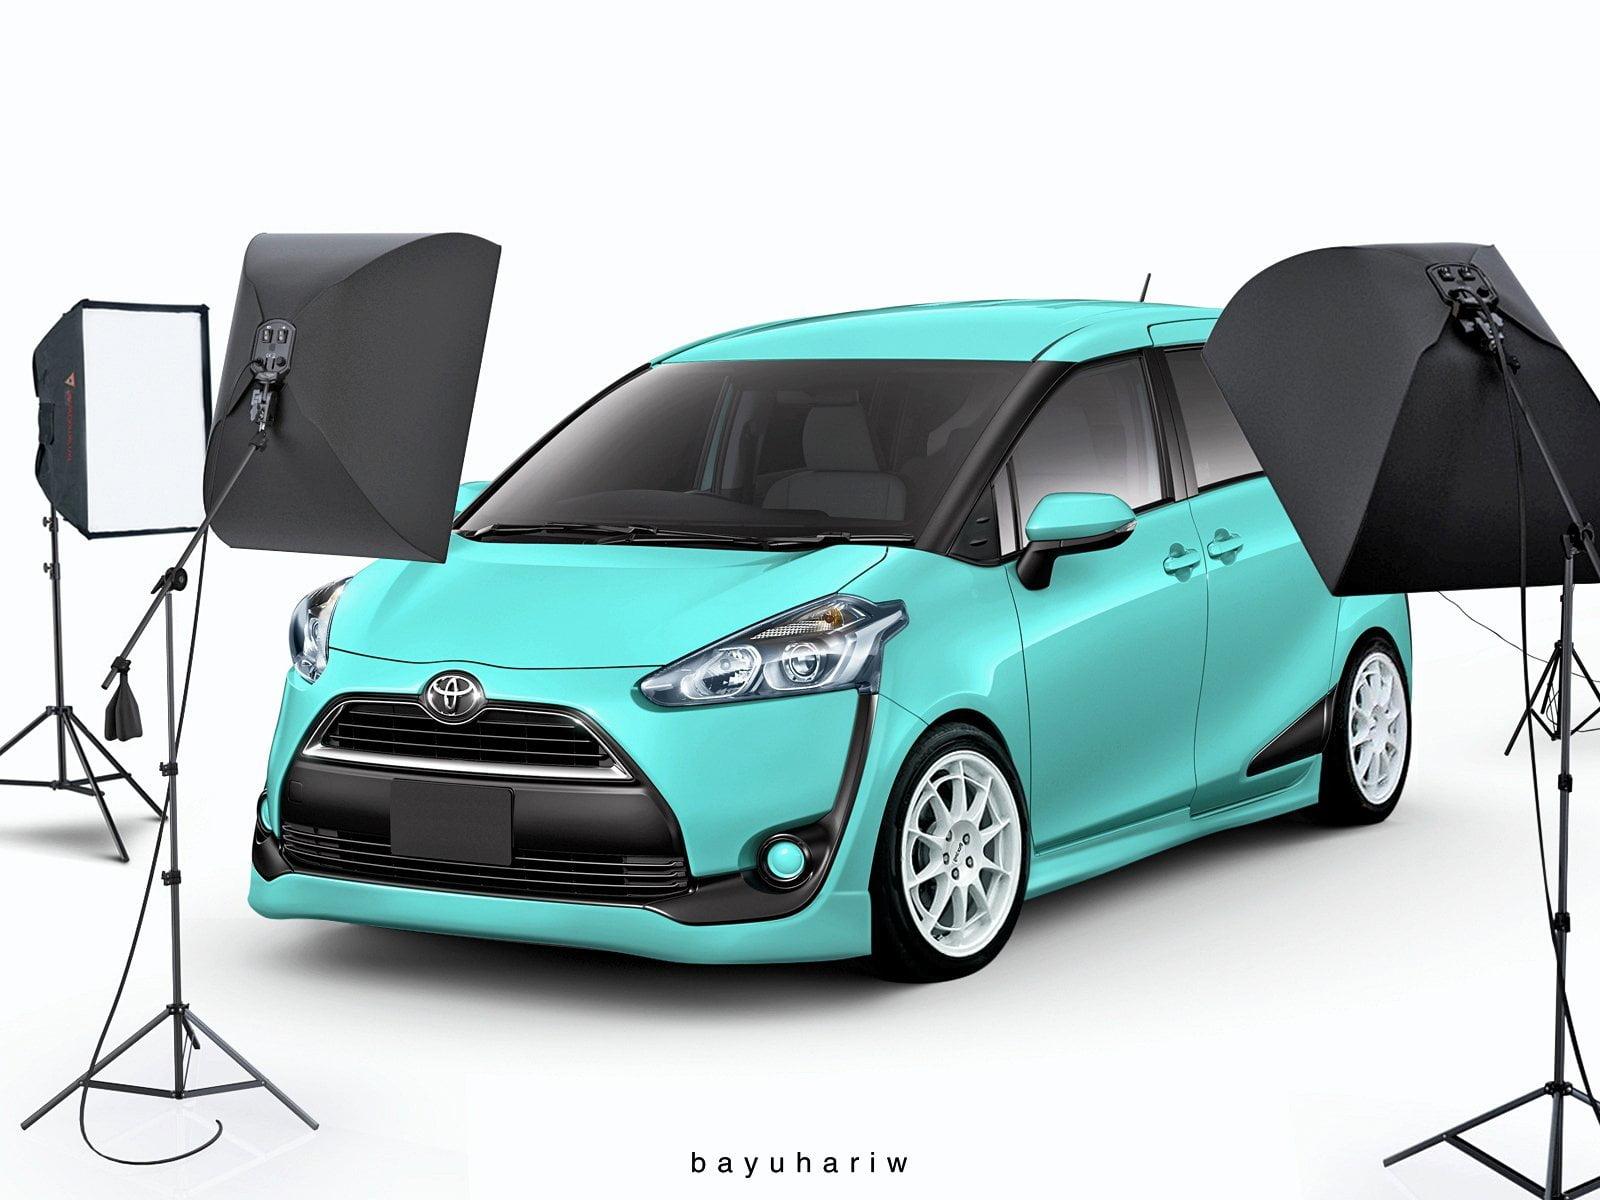 Japan Vehicles Market in April 2016